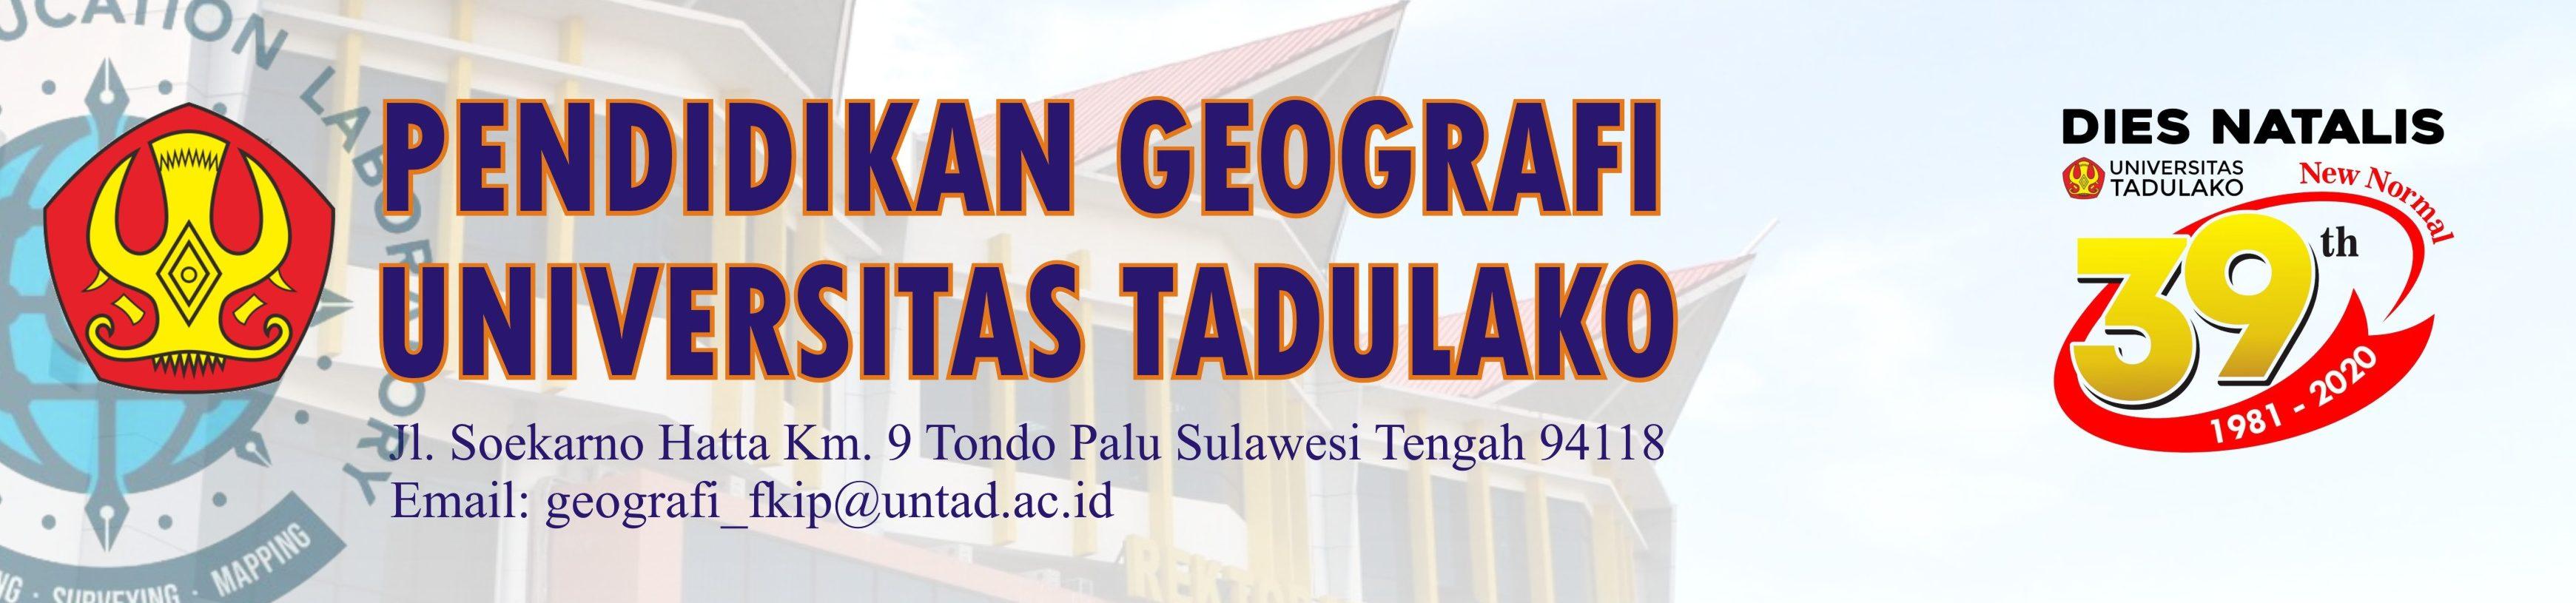 Geografi Fkip Untad